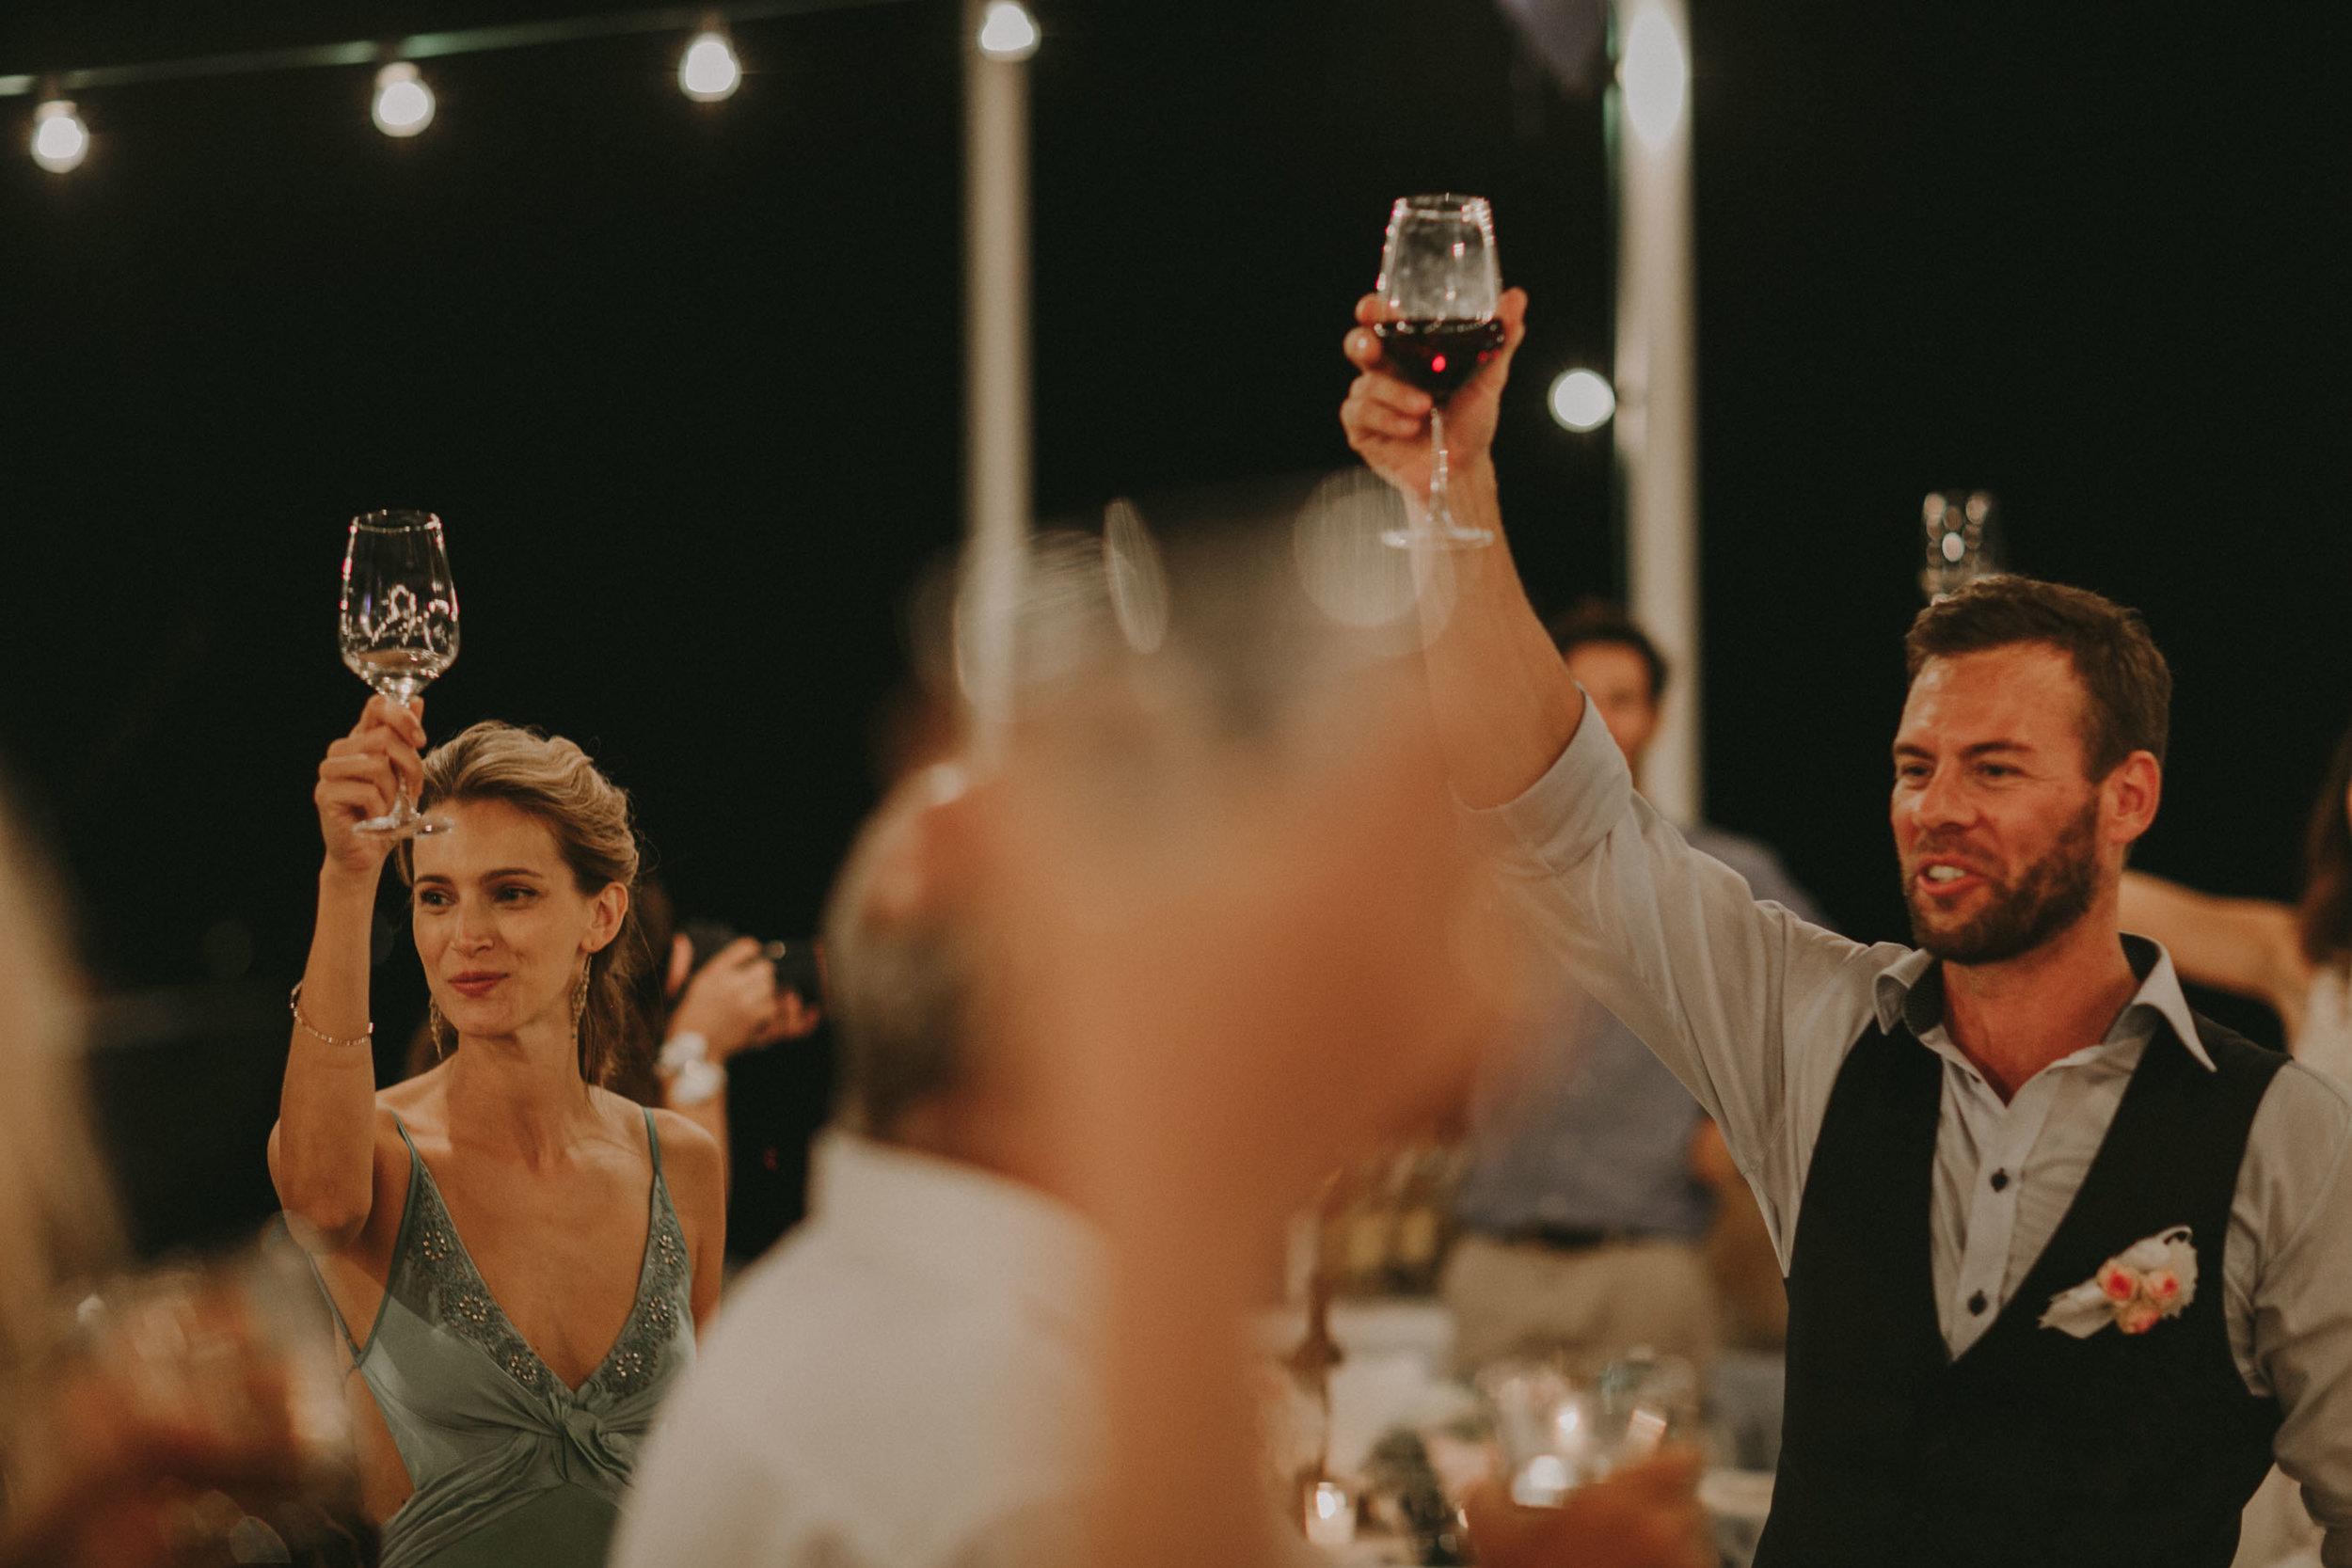 sylvia&dimitri-Wedding-Crvena_Luka-Croatia-111(9681).jpg